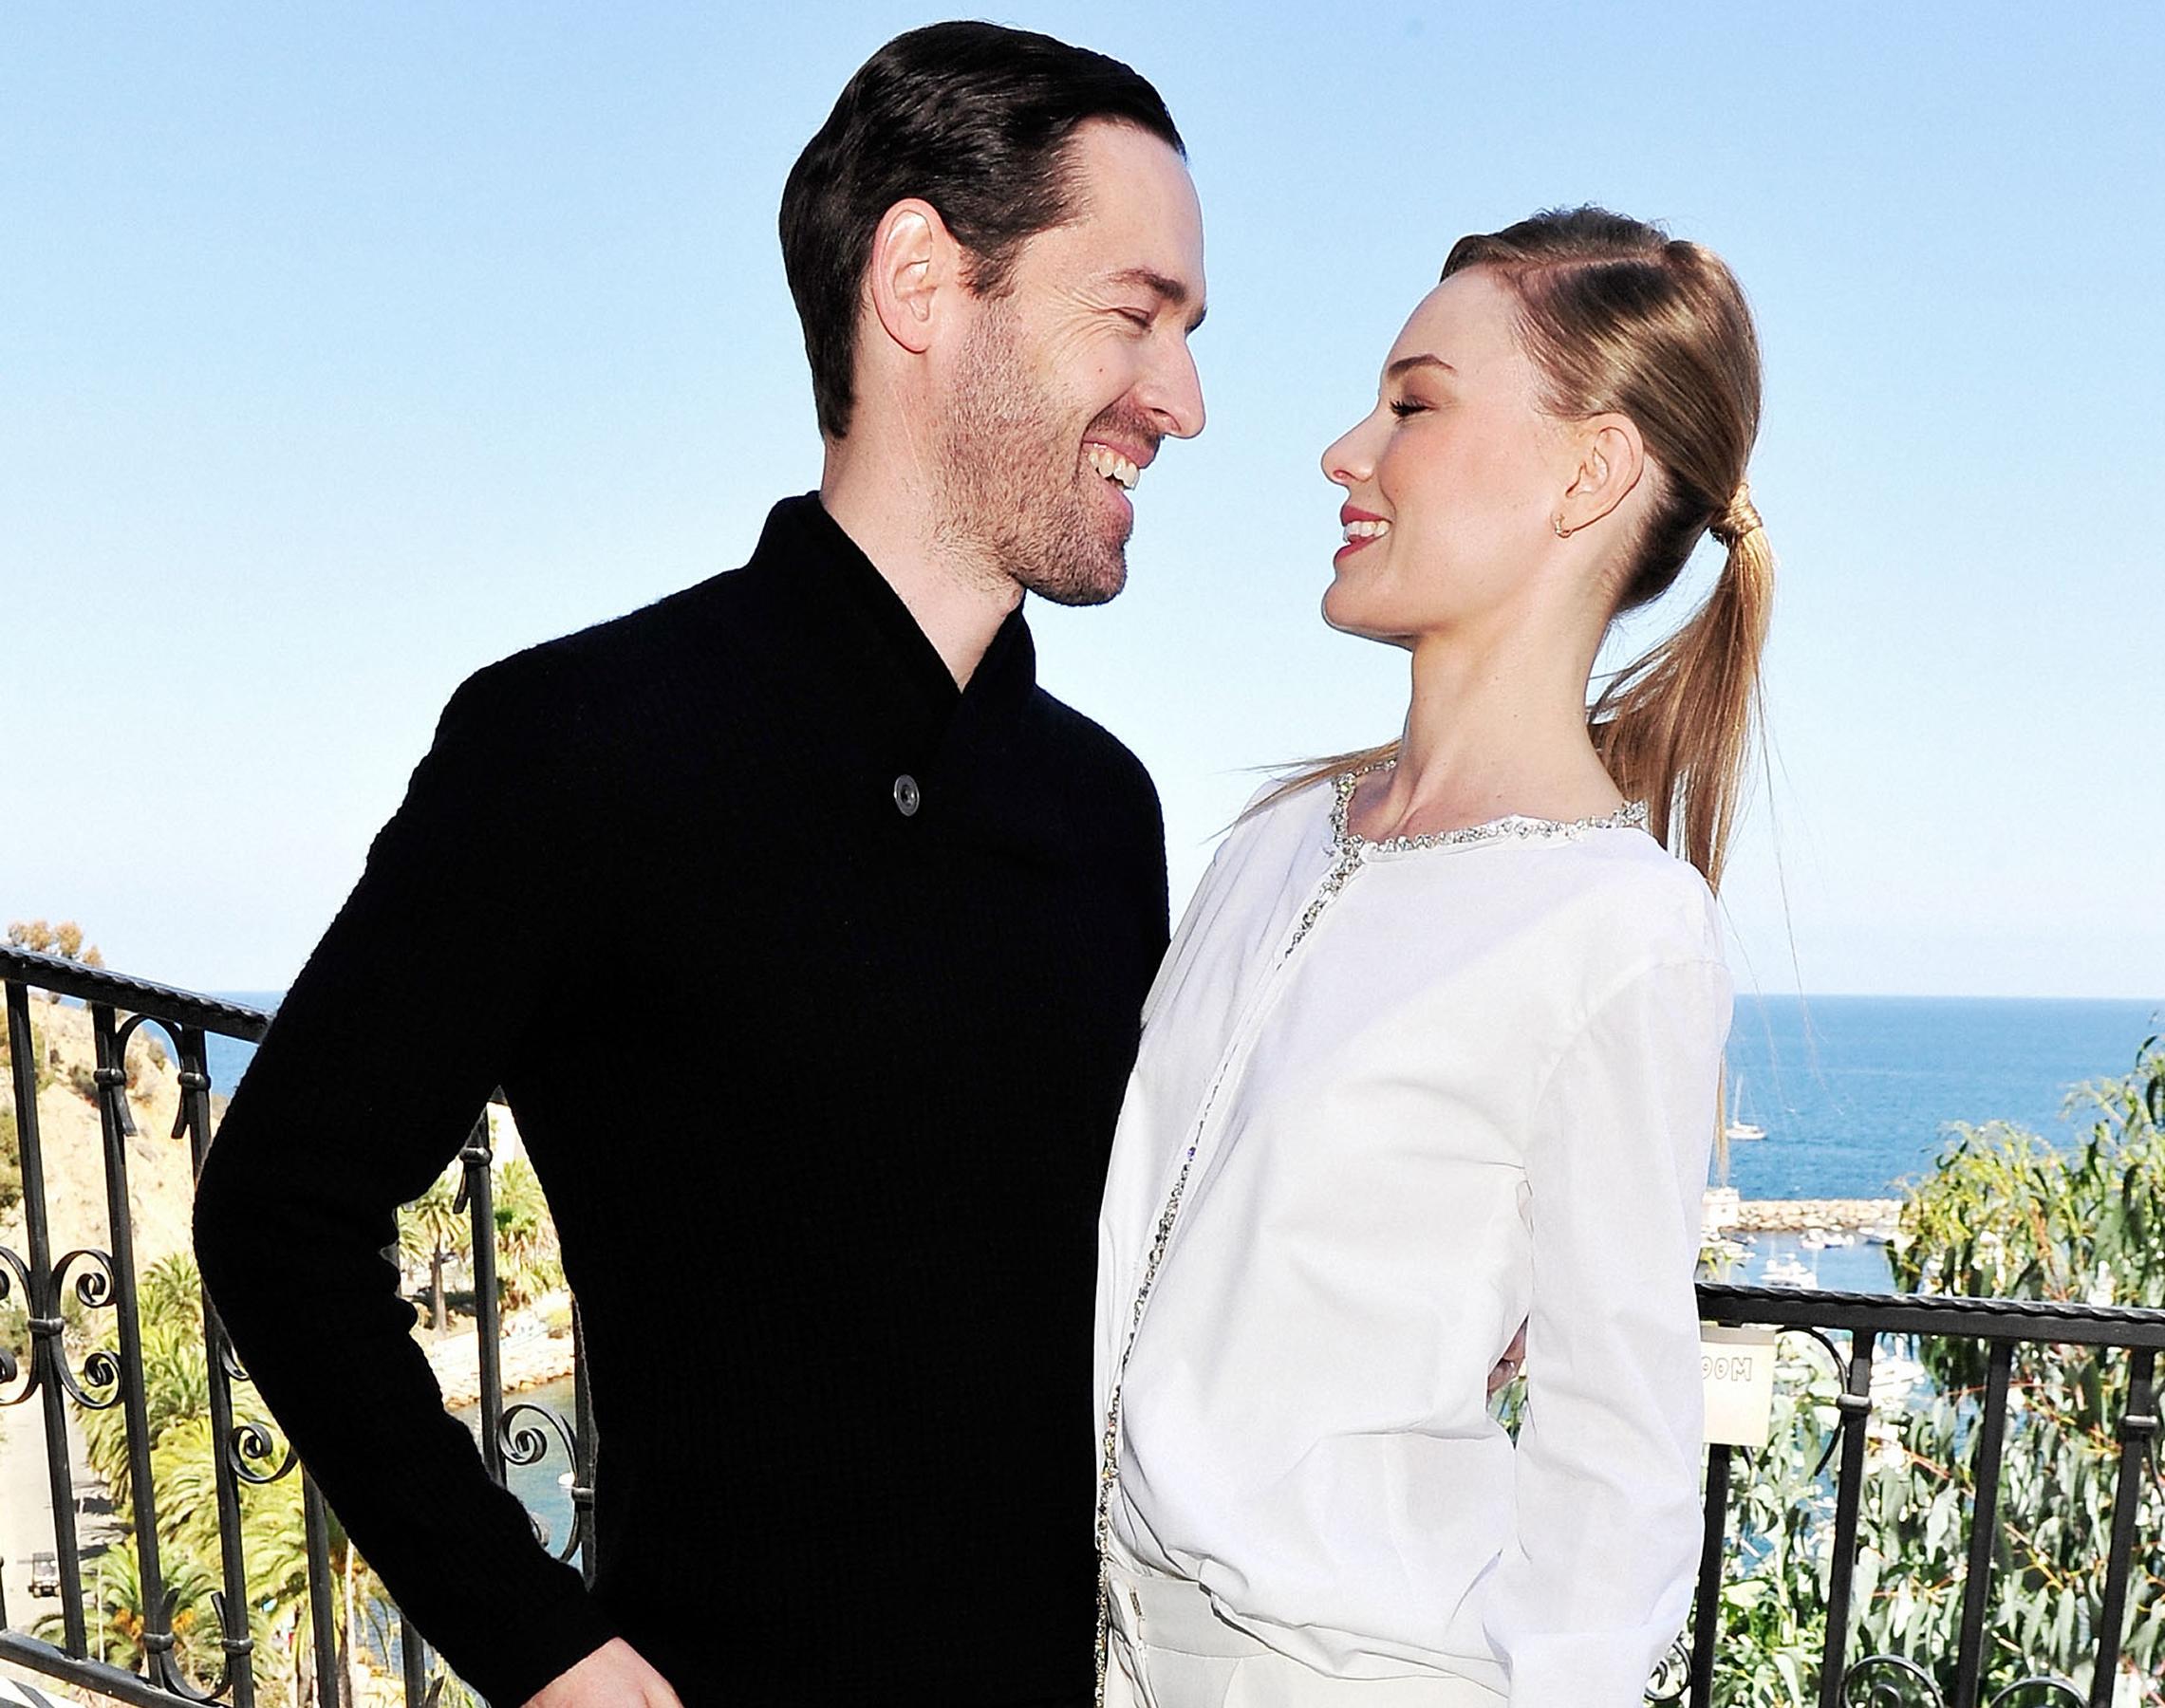 Joka on dating Kate Bosworth